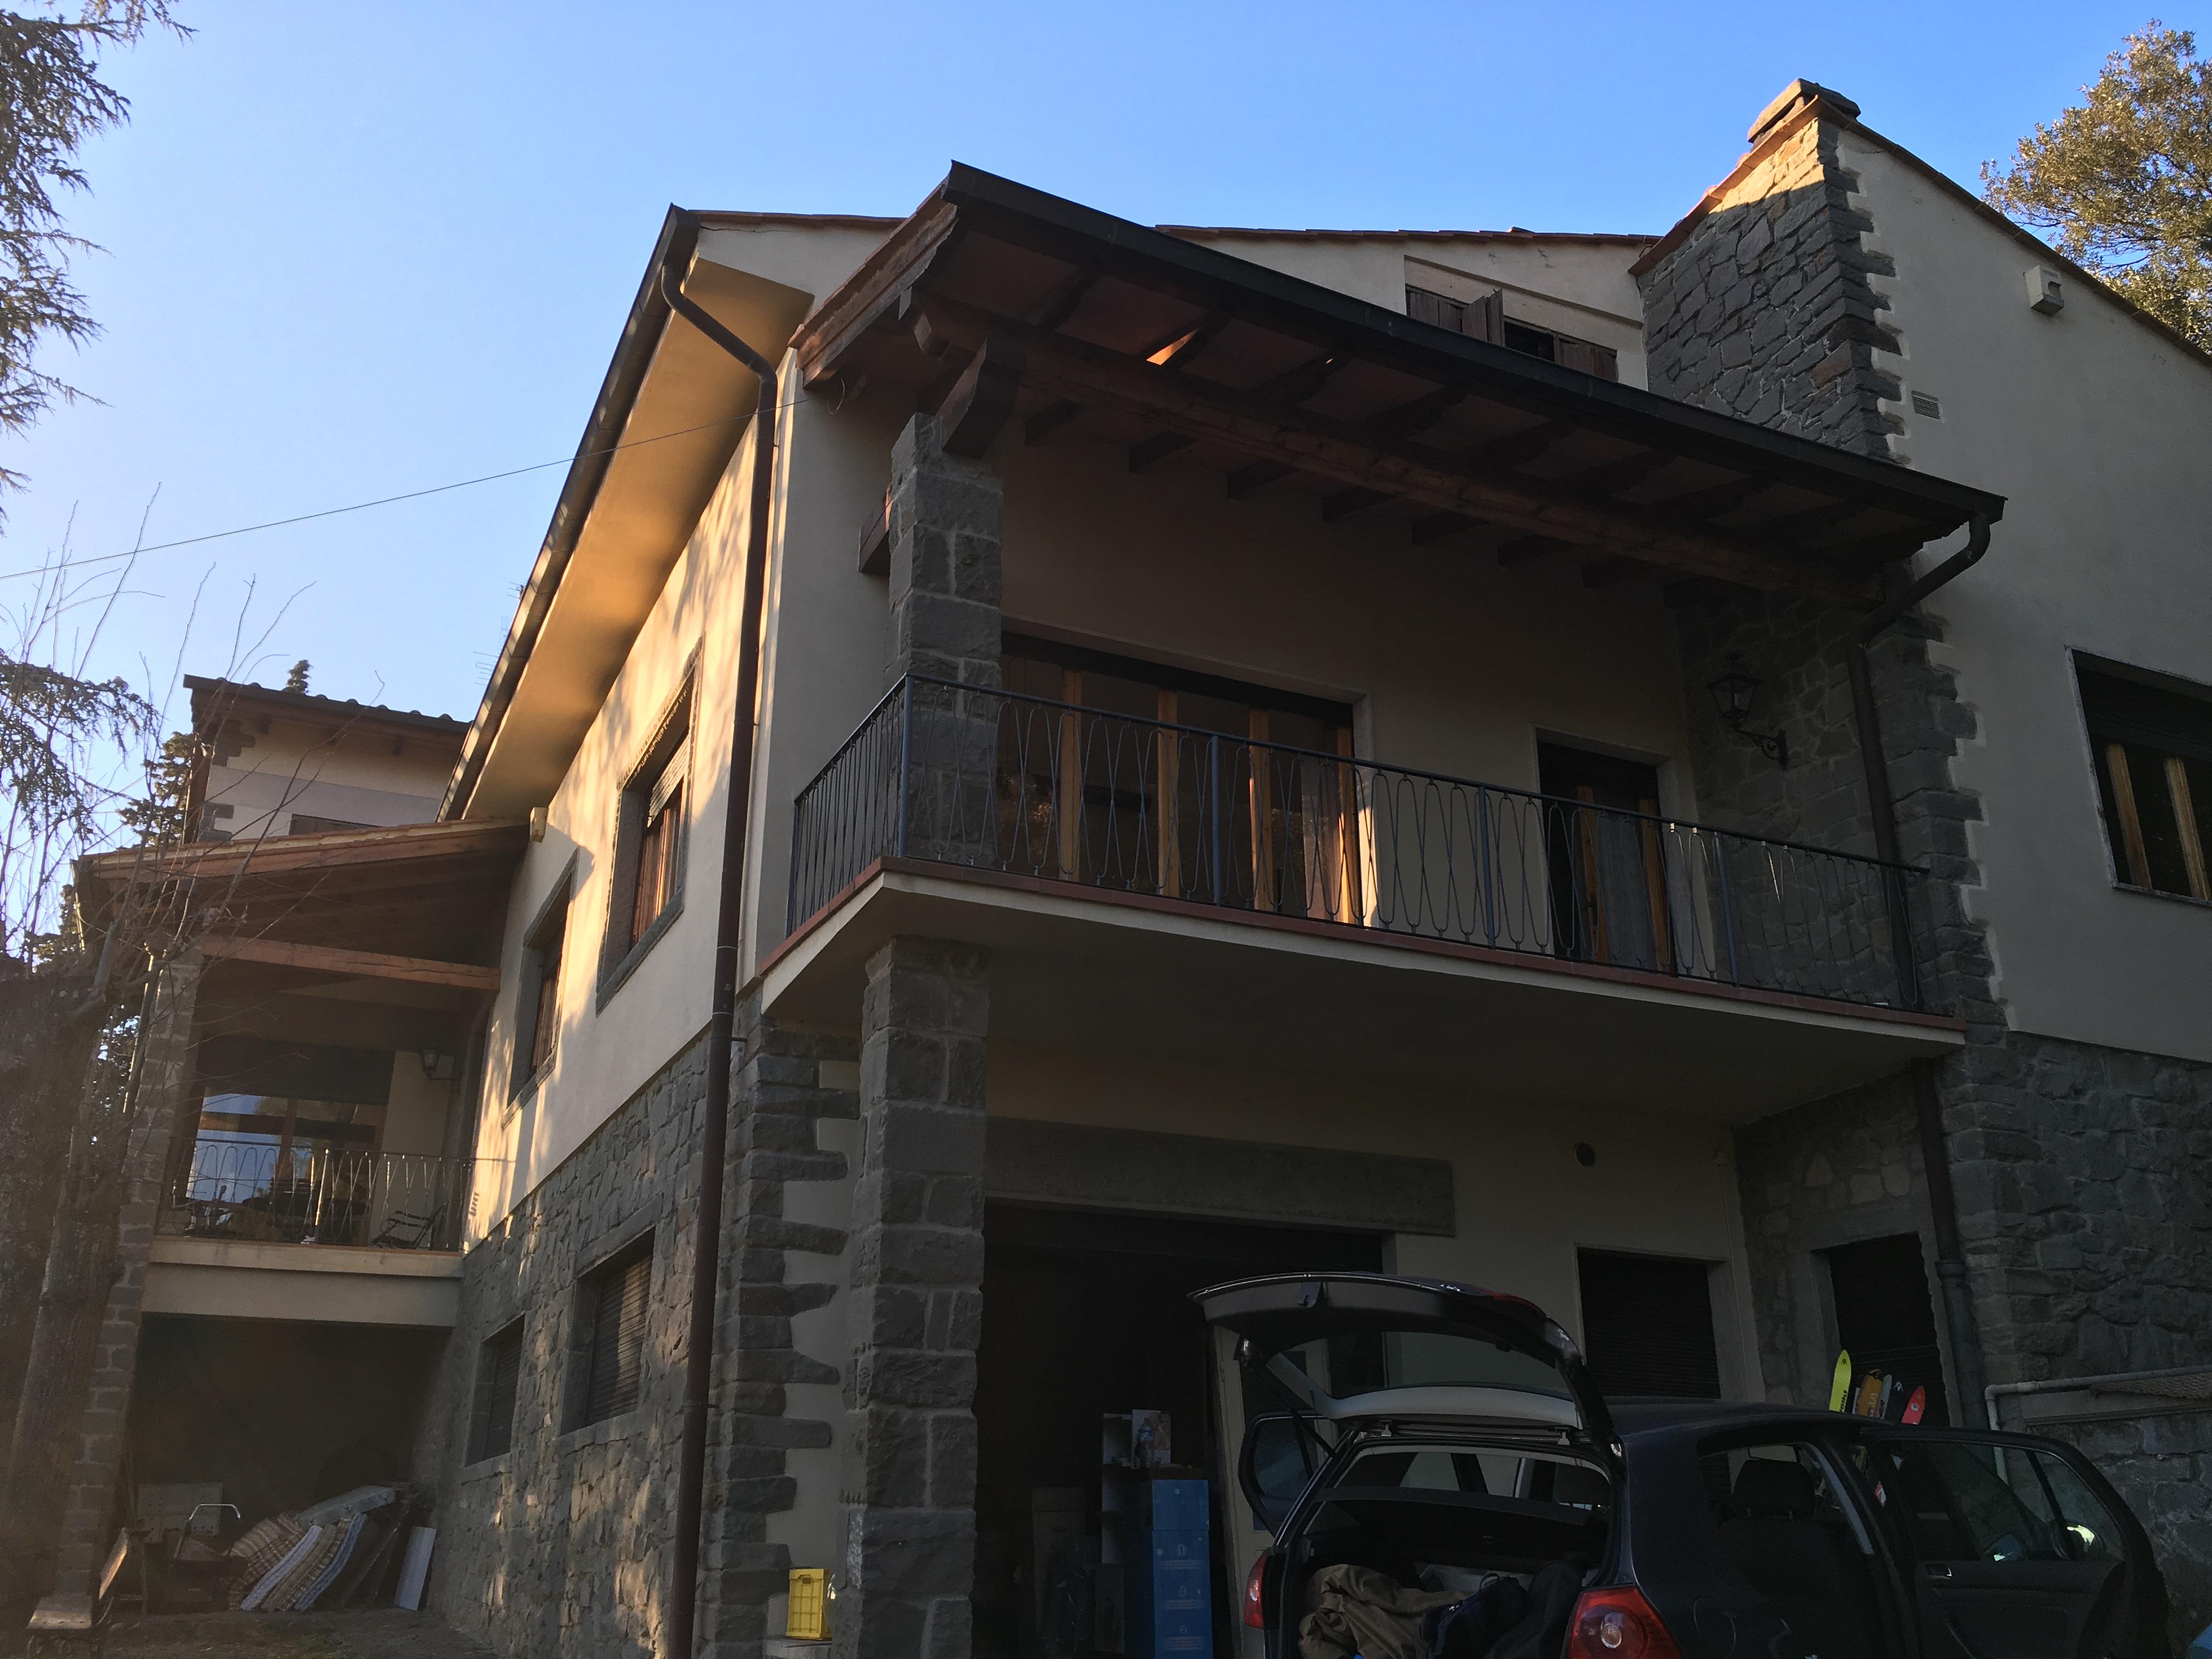 IMPRUNETA porzione di villa panoramica